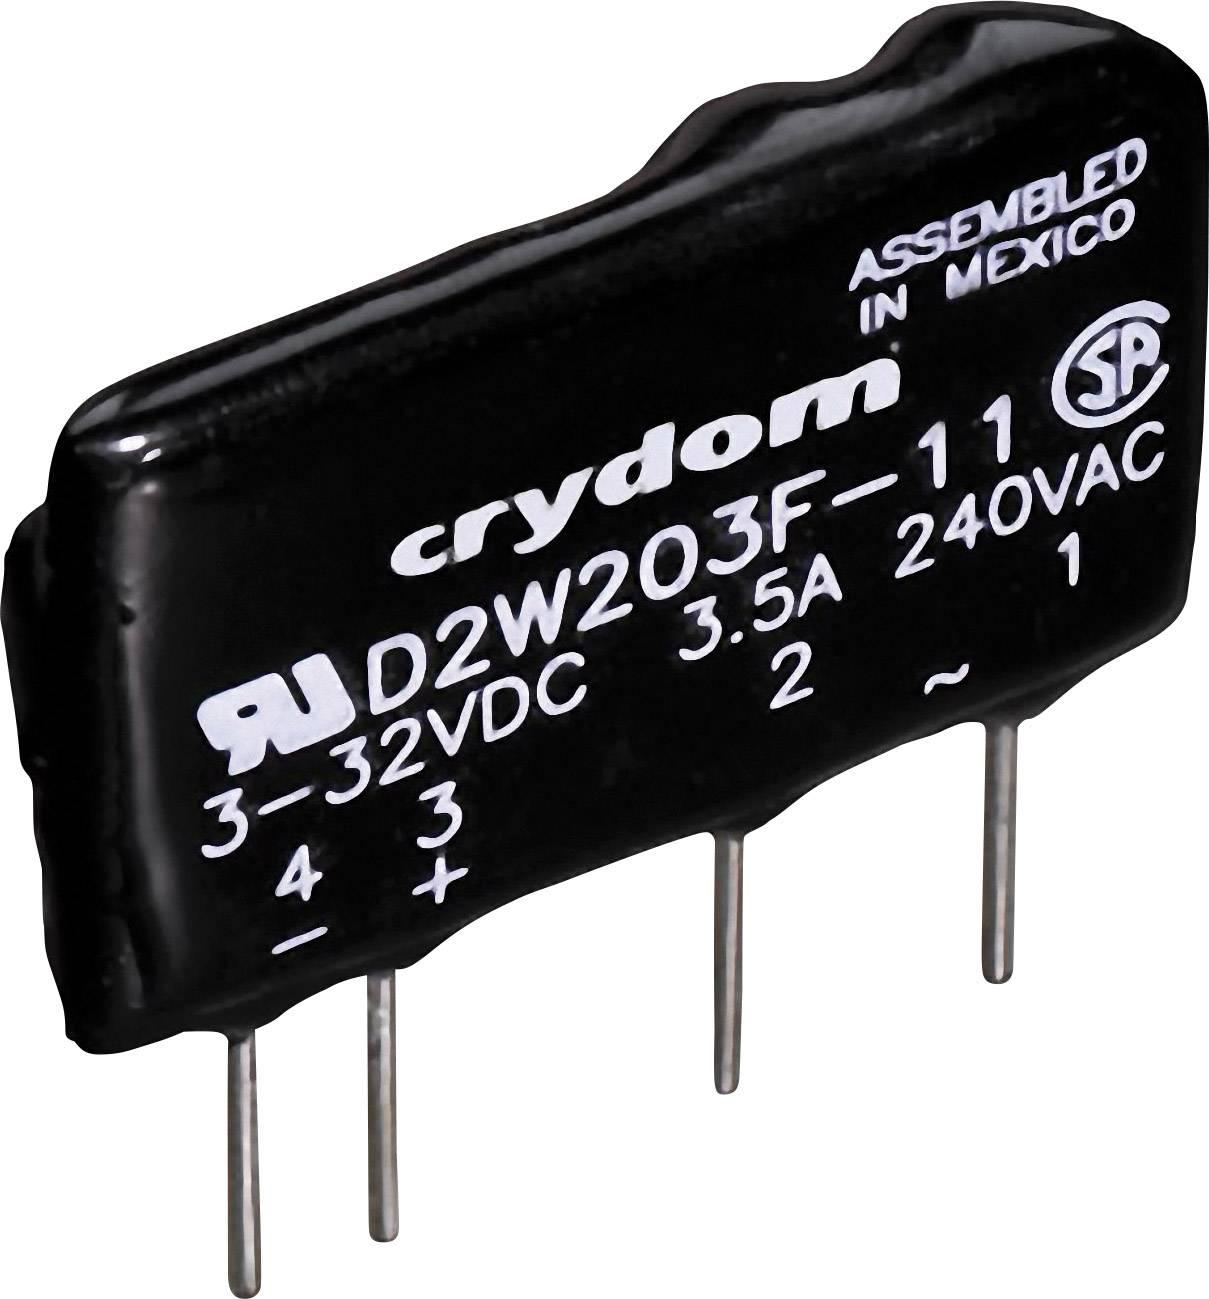 Polovodičové relé Crydom D2W202F D2W202F, 2 A, 1 ks